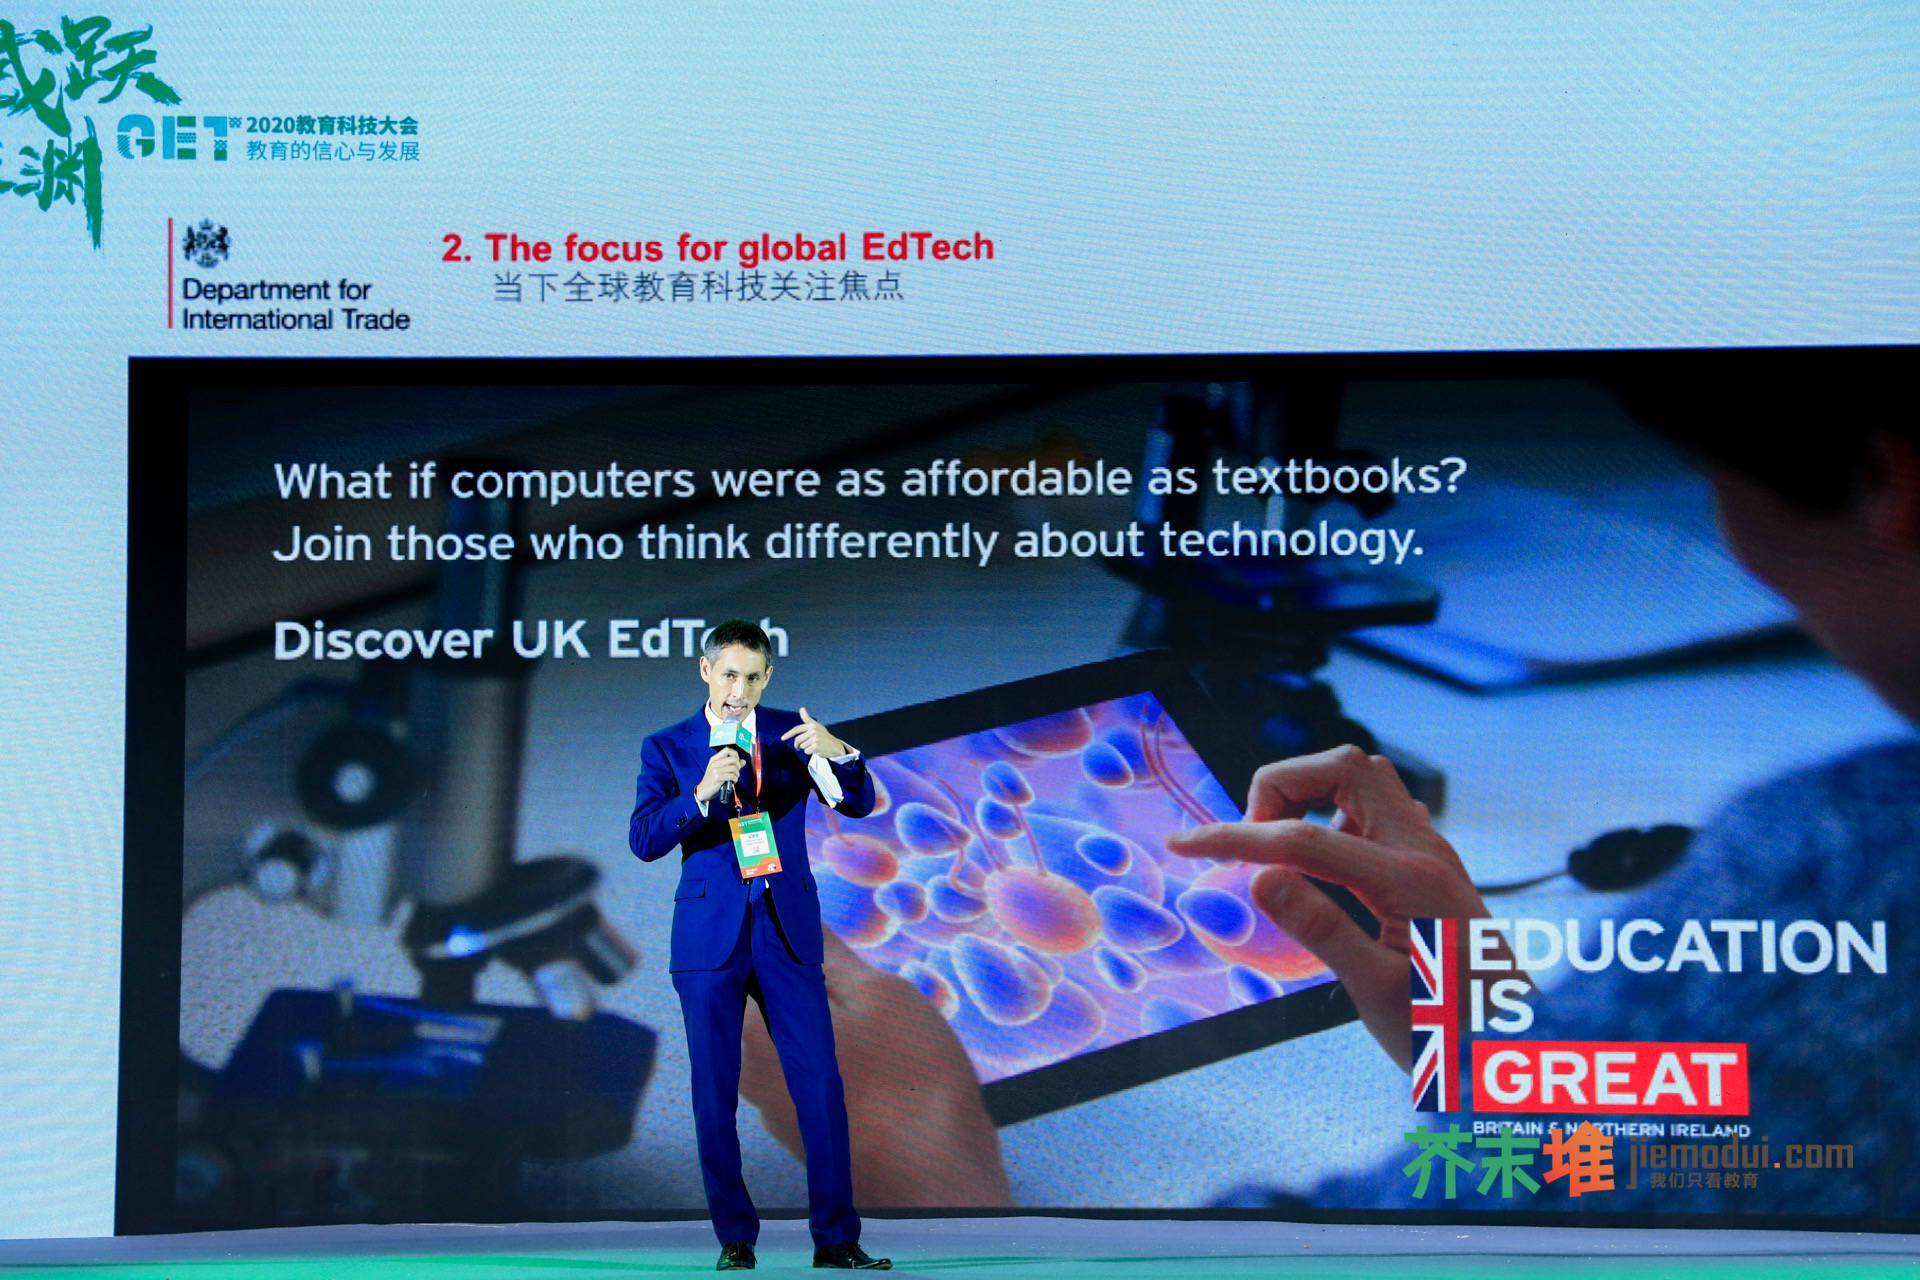 【GET2020】英国驻华贸易使节吴侨文:未来教育需要更强的个性化适应性技术